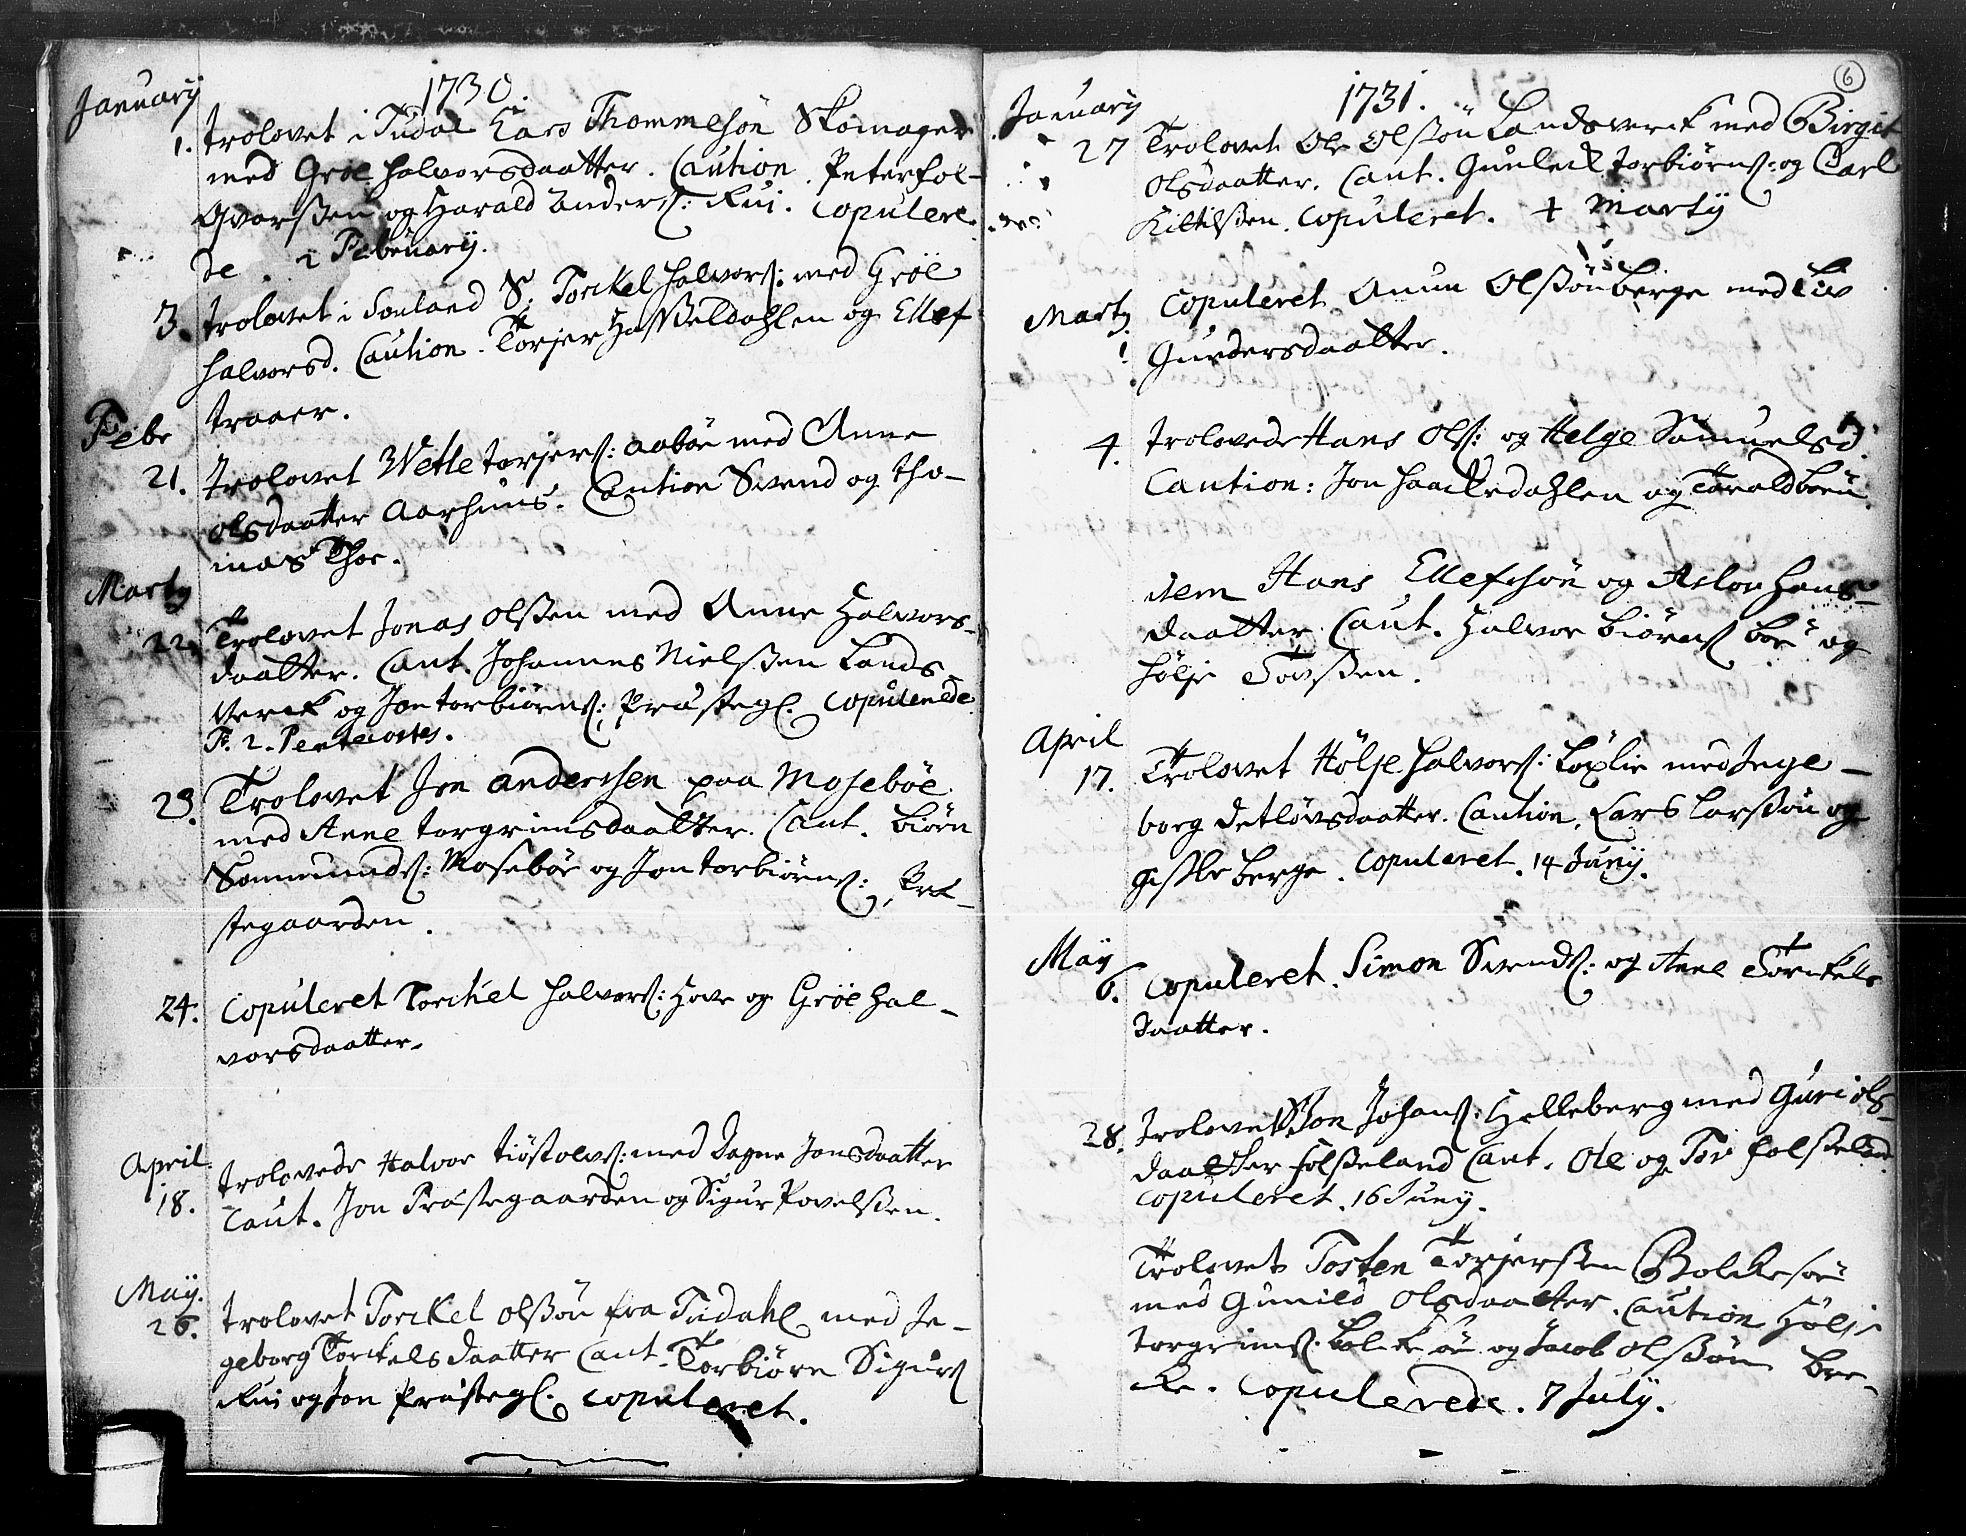 SAKO, Hjartdal kirkebøker, F/Fa/L0004: Ministerialbok nr. I 4, 1727-1795, s. 6